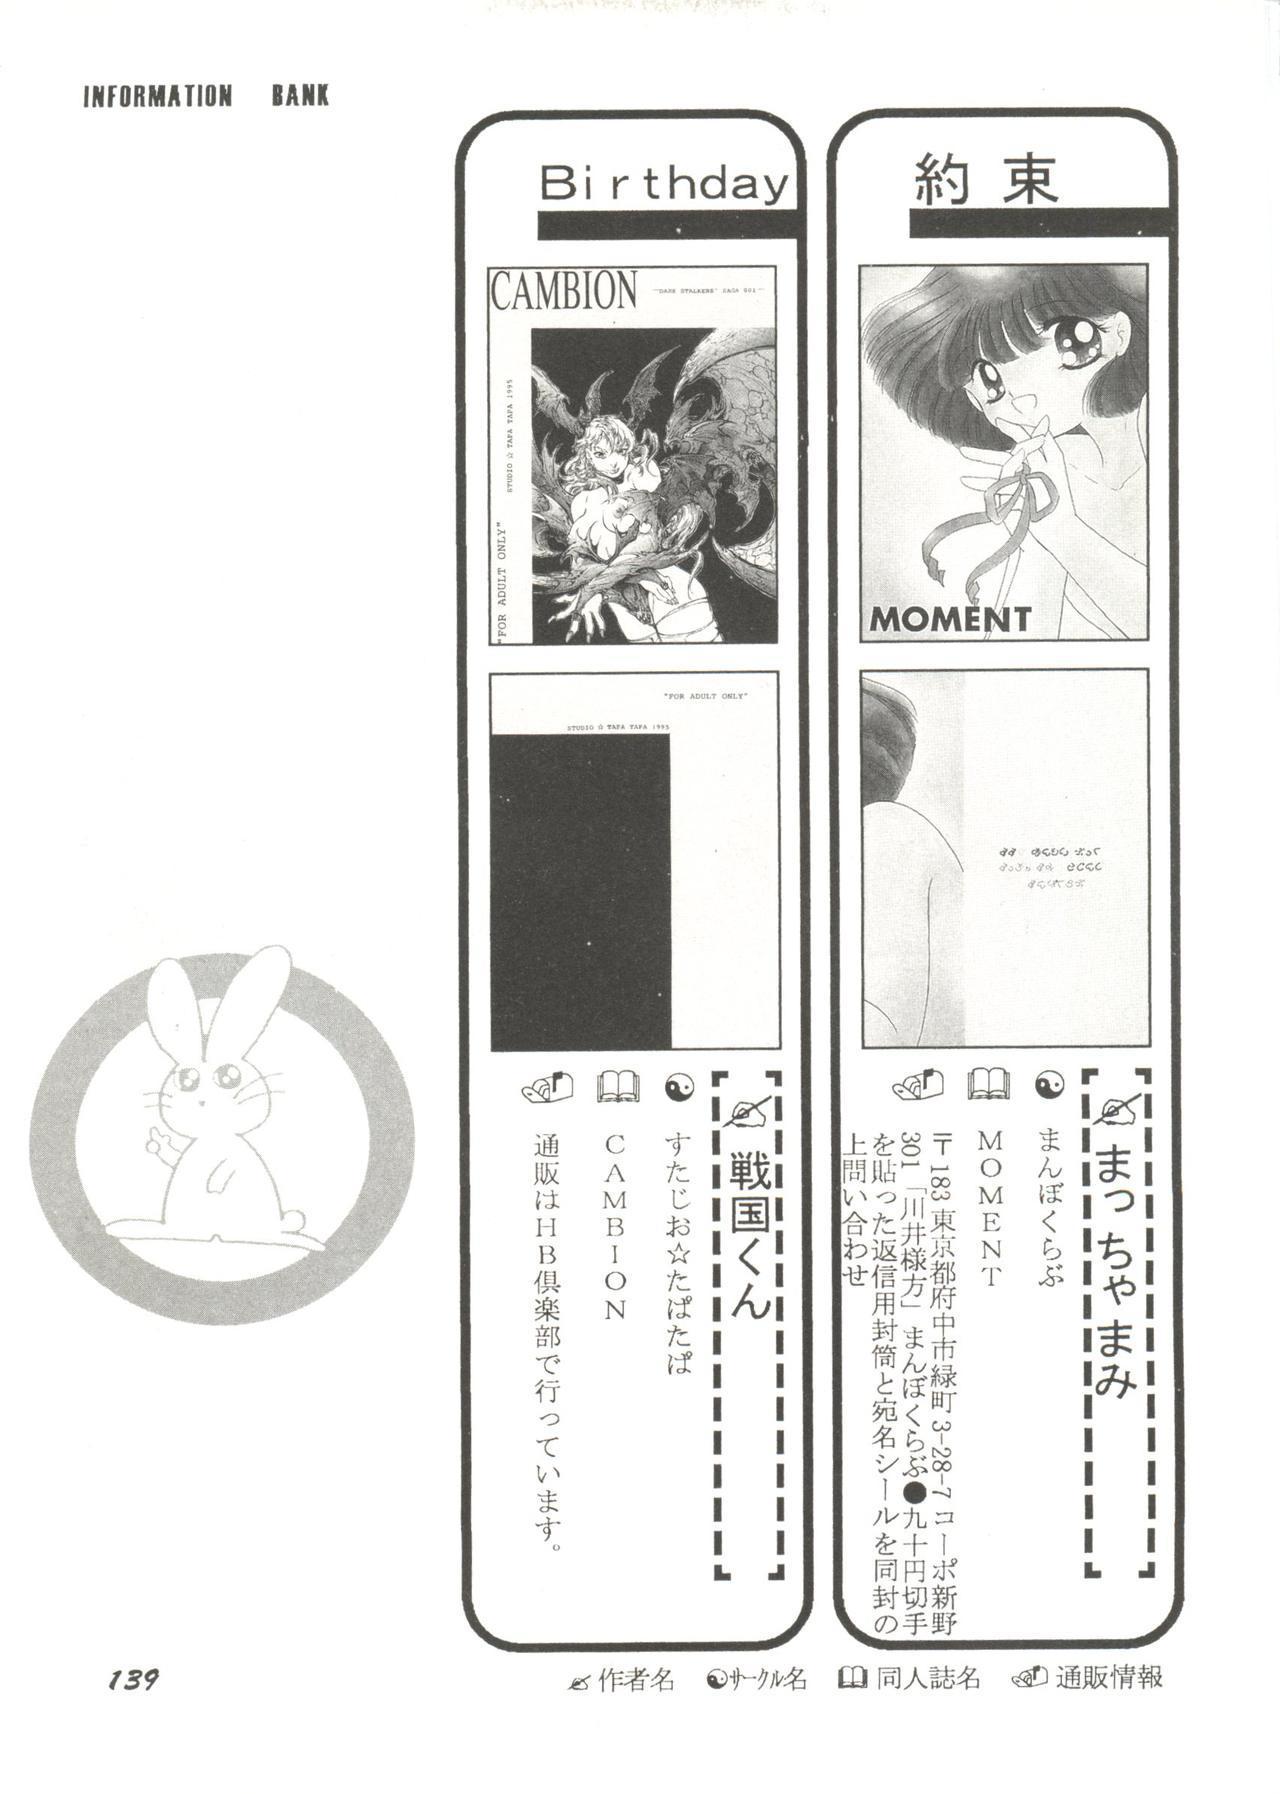 Bishoujo Doujin Peach Club - Pretty Gal's Fanzine Peach Club 9 140